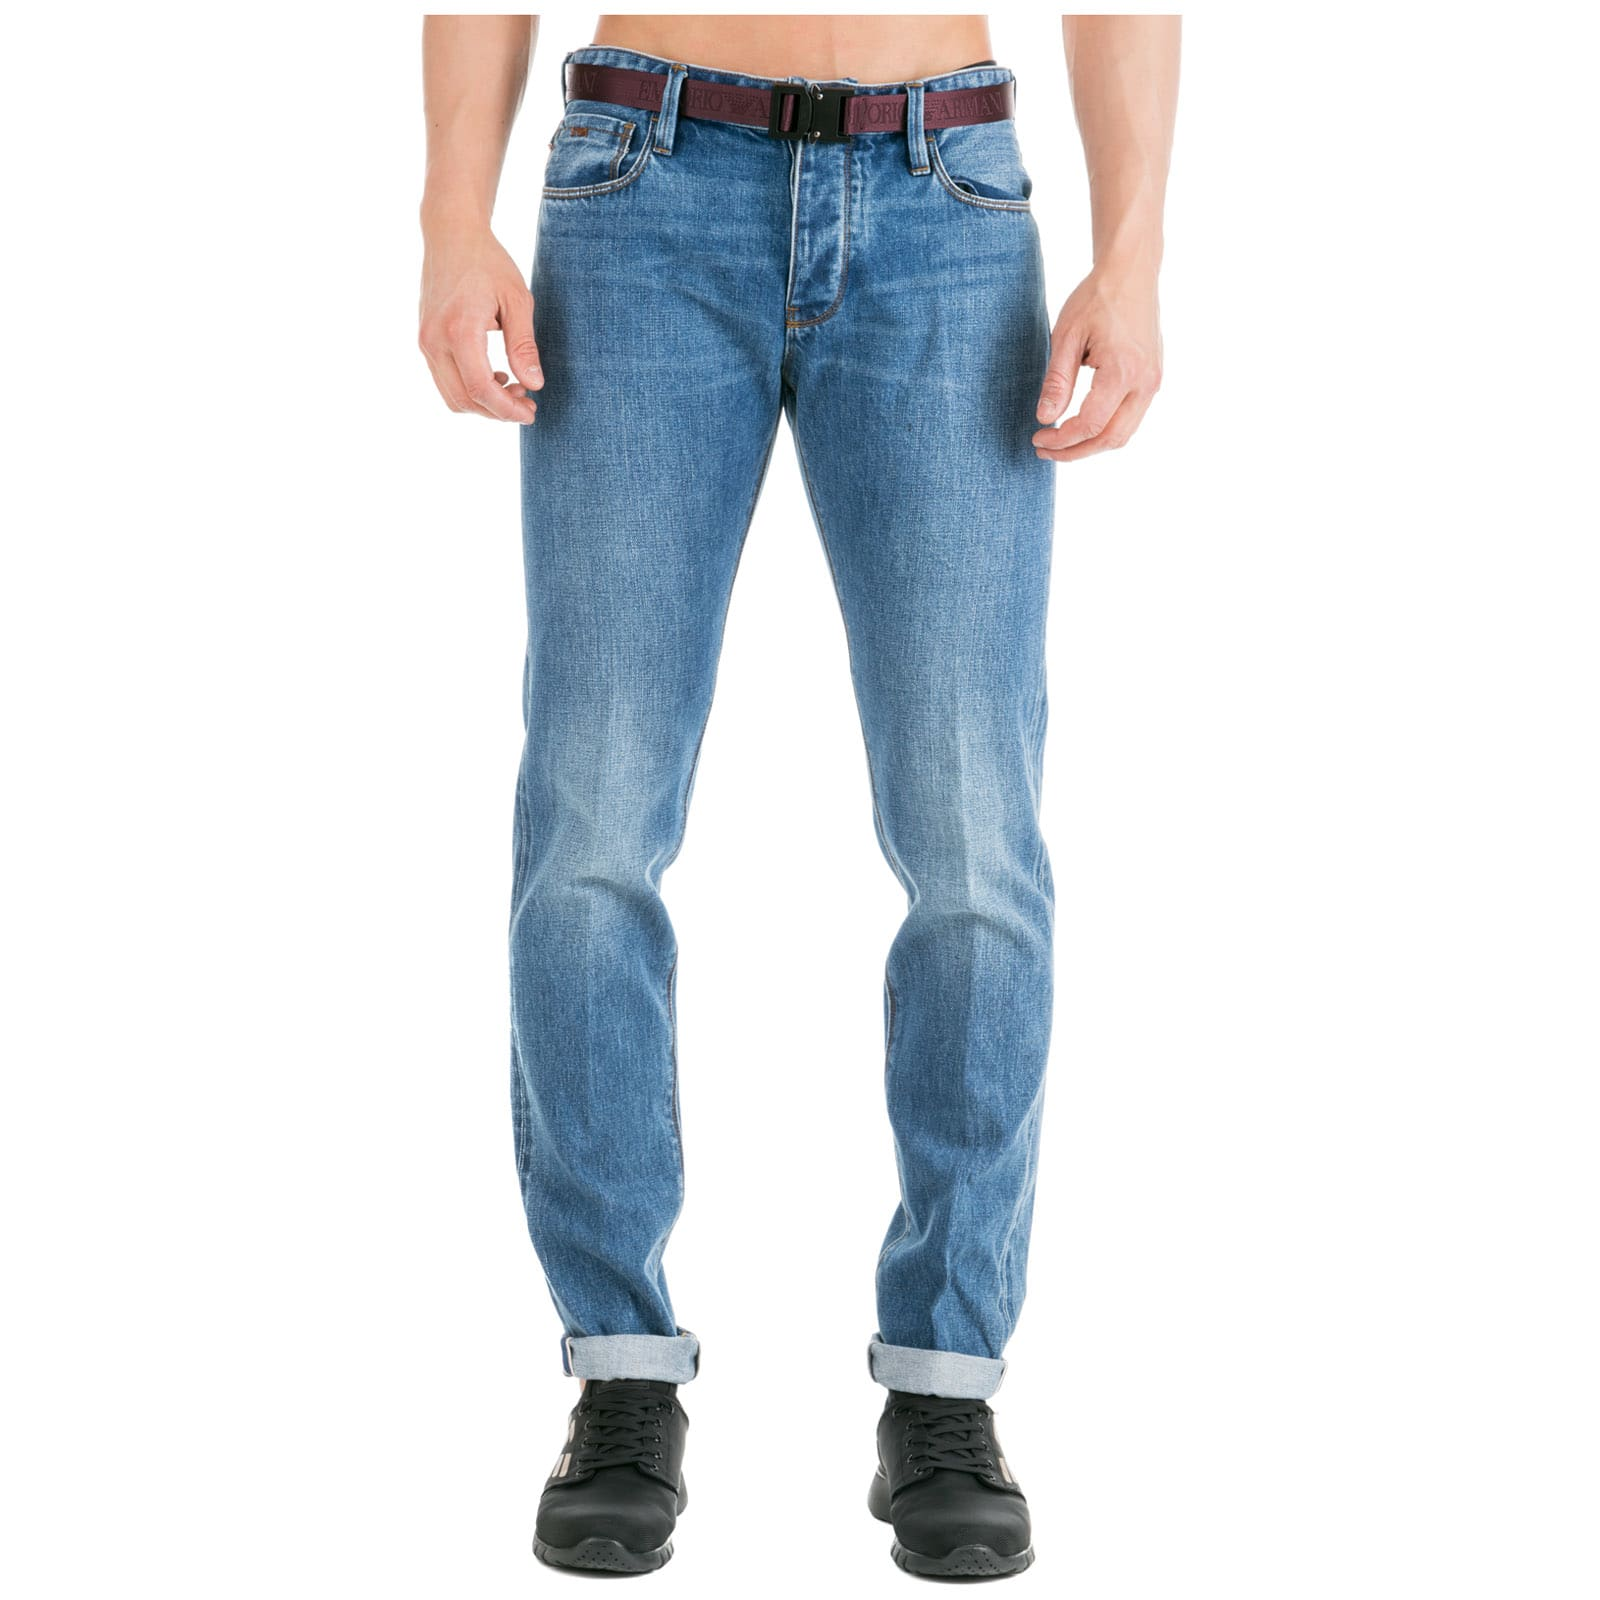 15d276caa Emporio Armani Jeans Denim Slim Fit